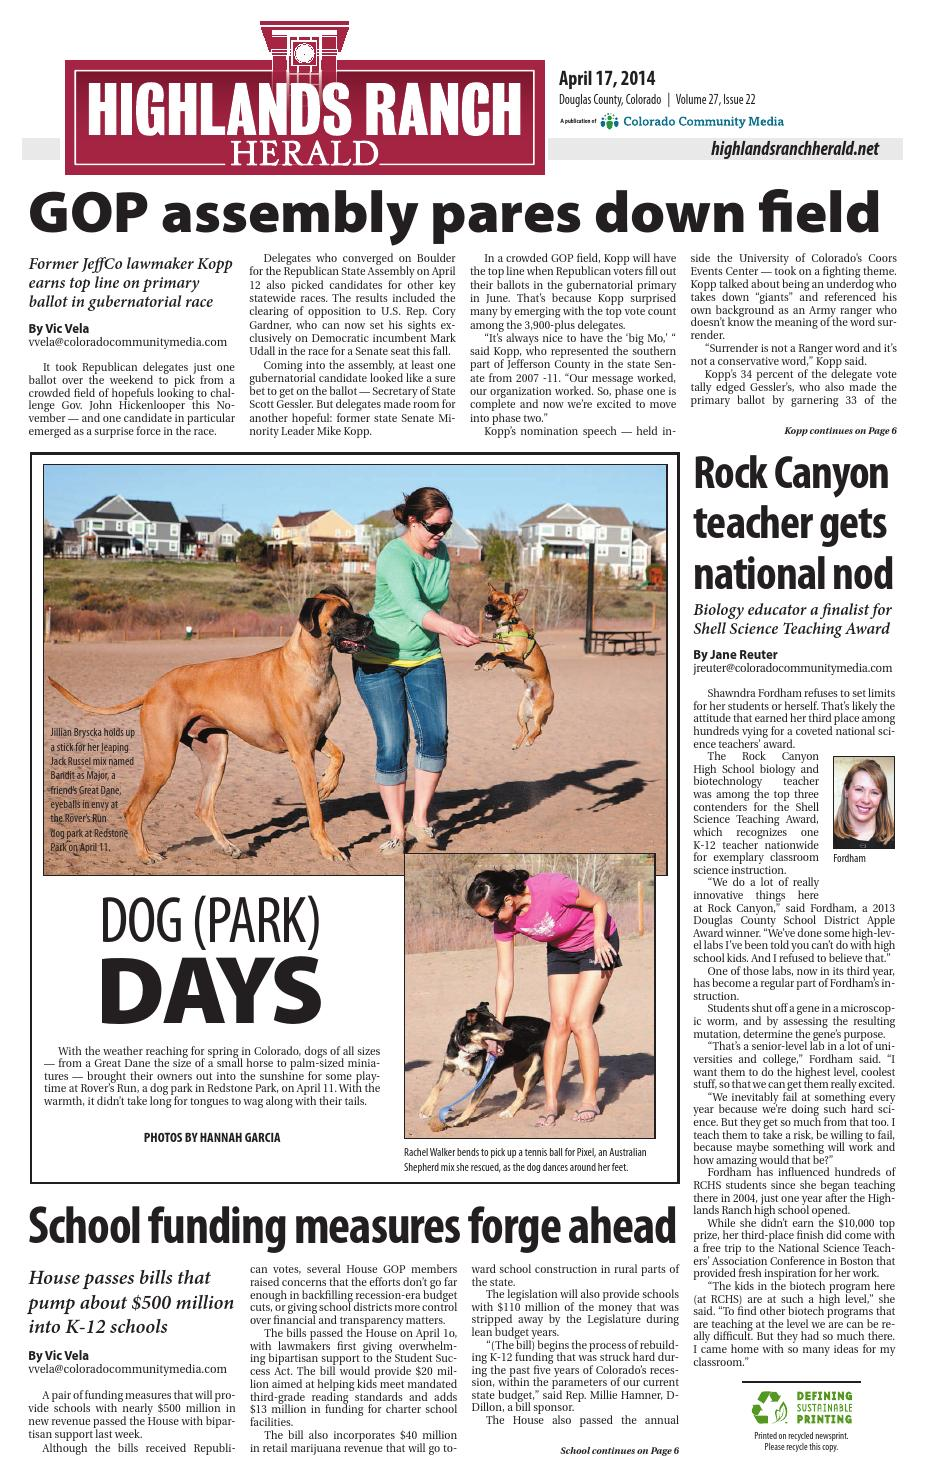 Highlands ranch herald 0417 by Colorado Community Media - issuu